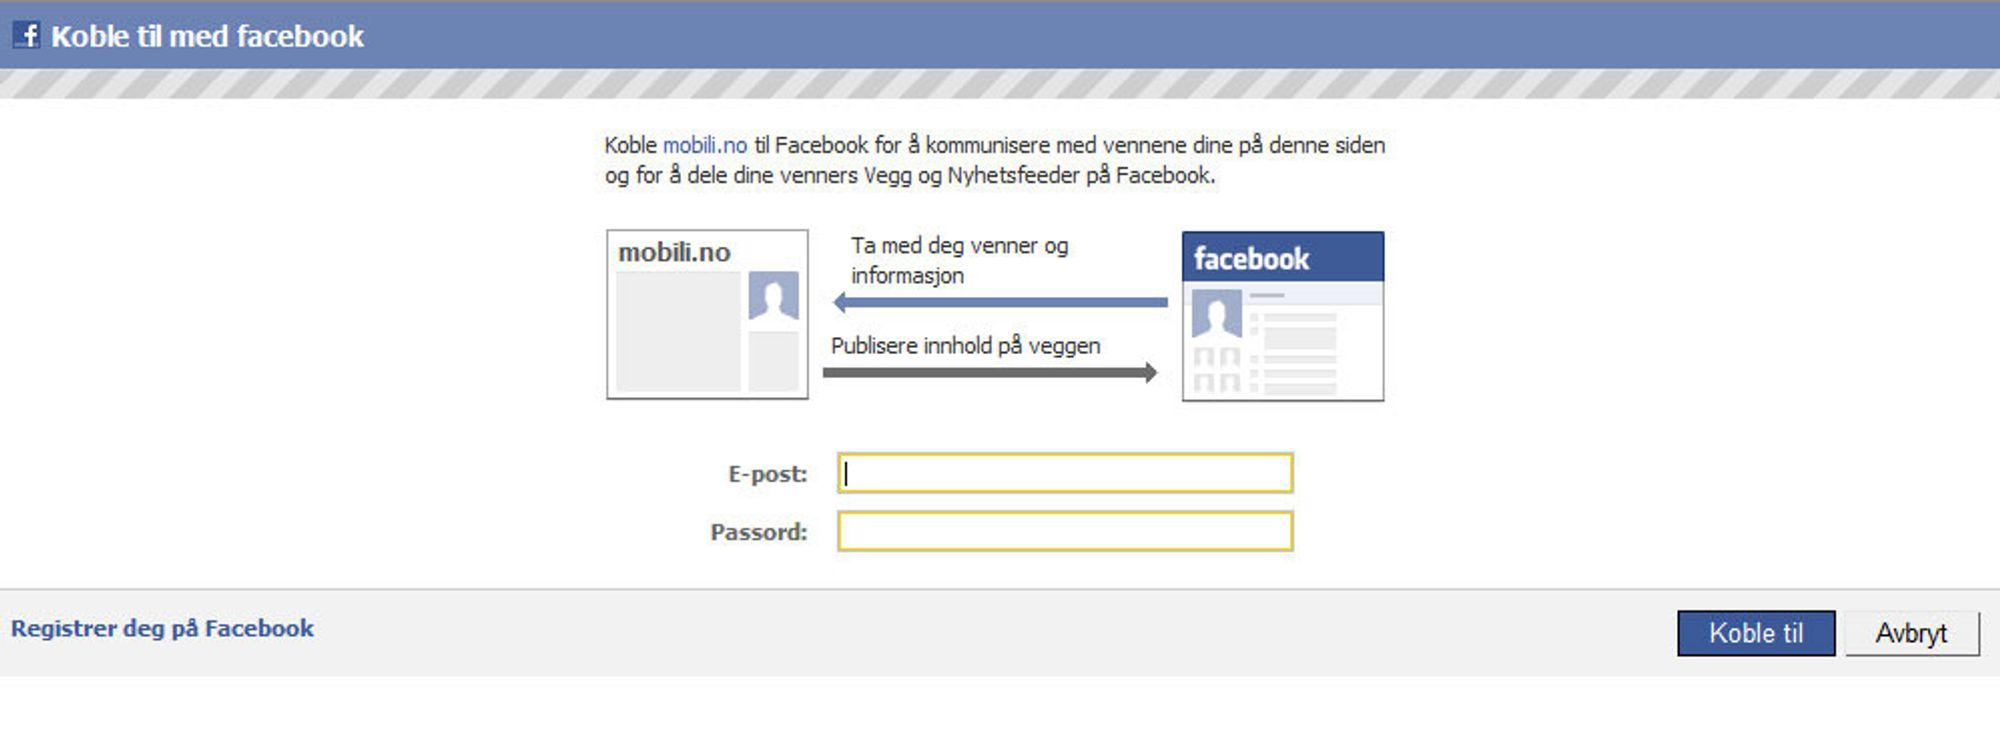 Mobili + Facebook = sant!